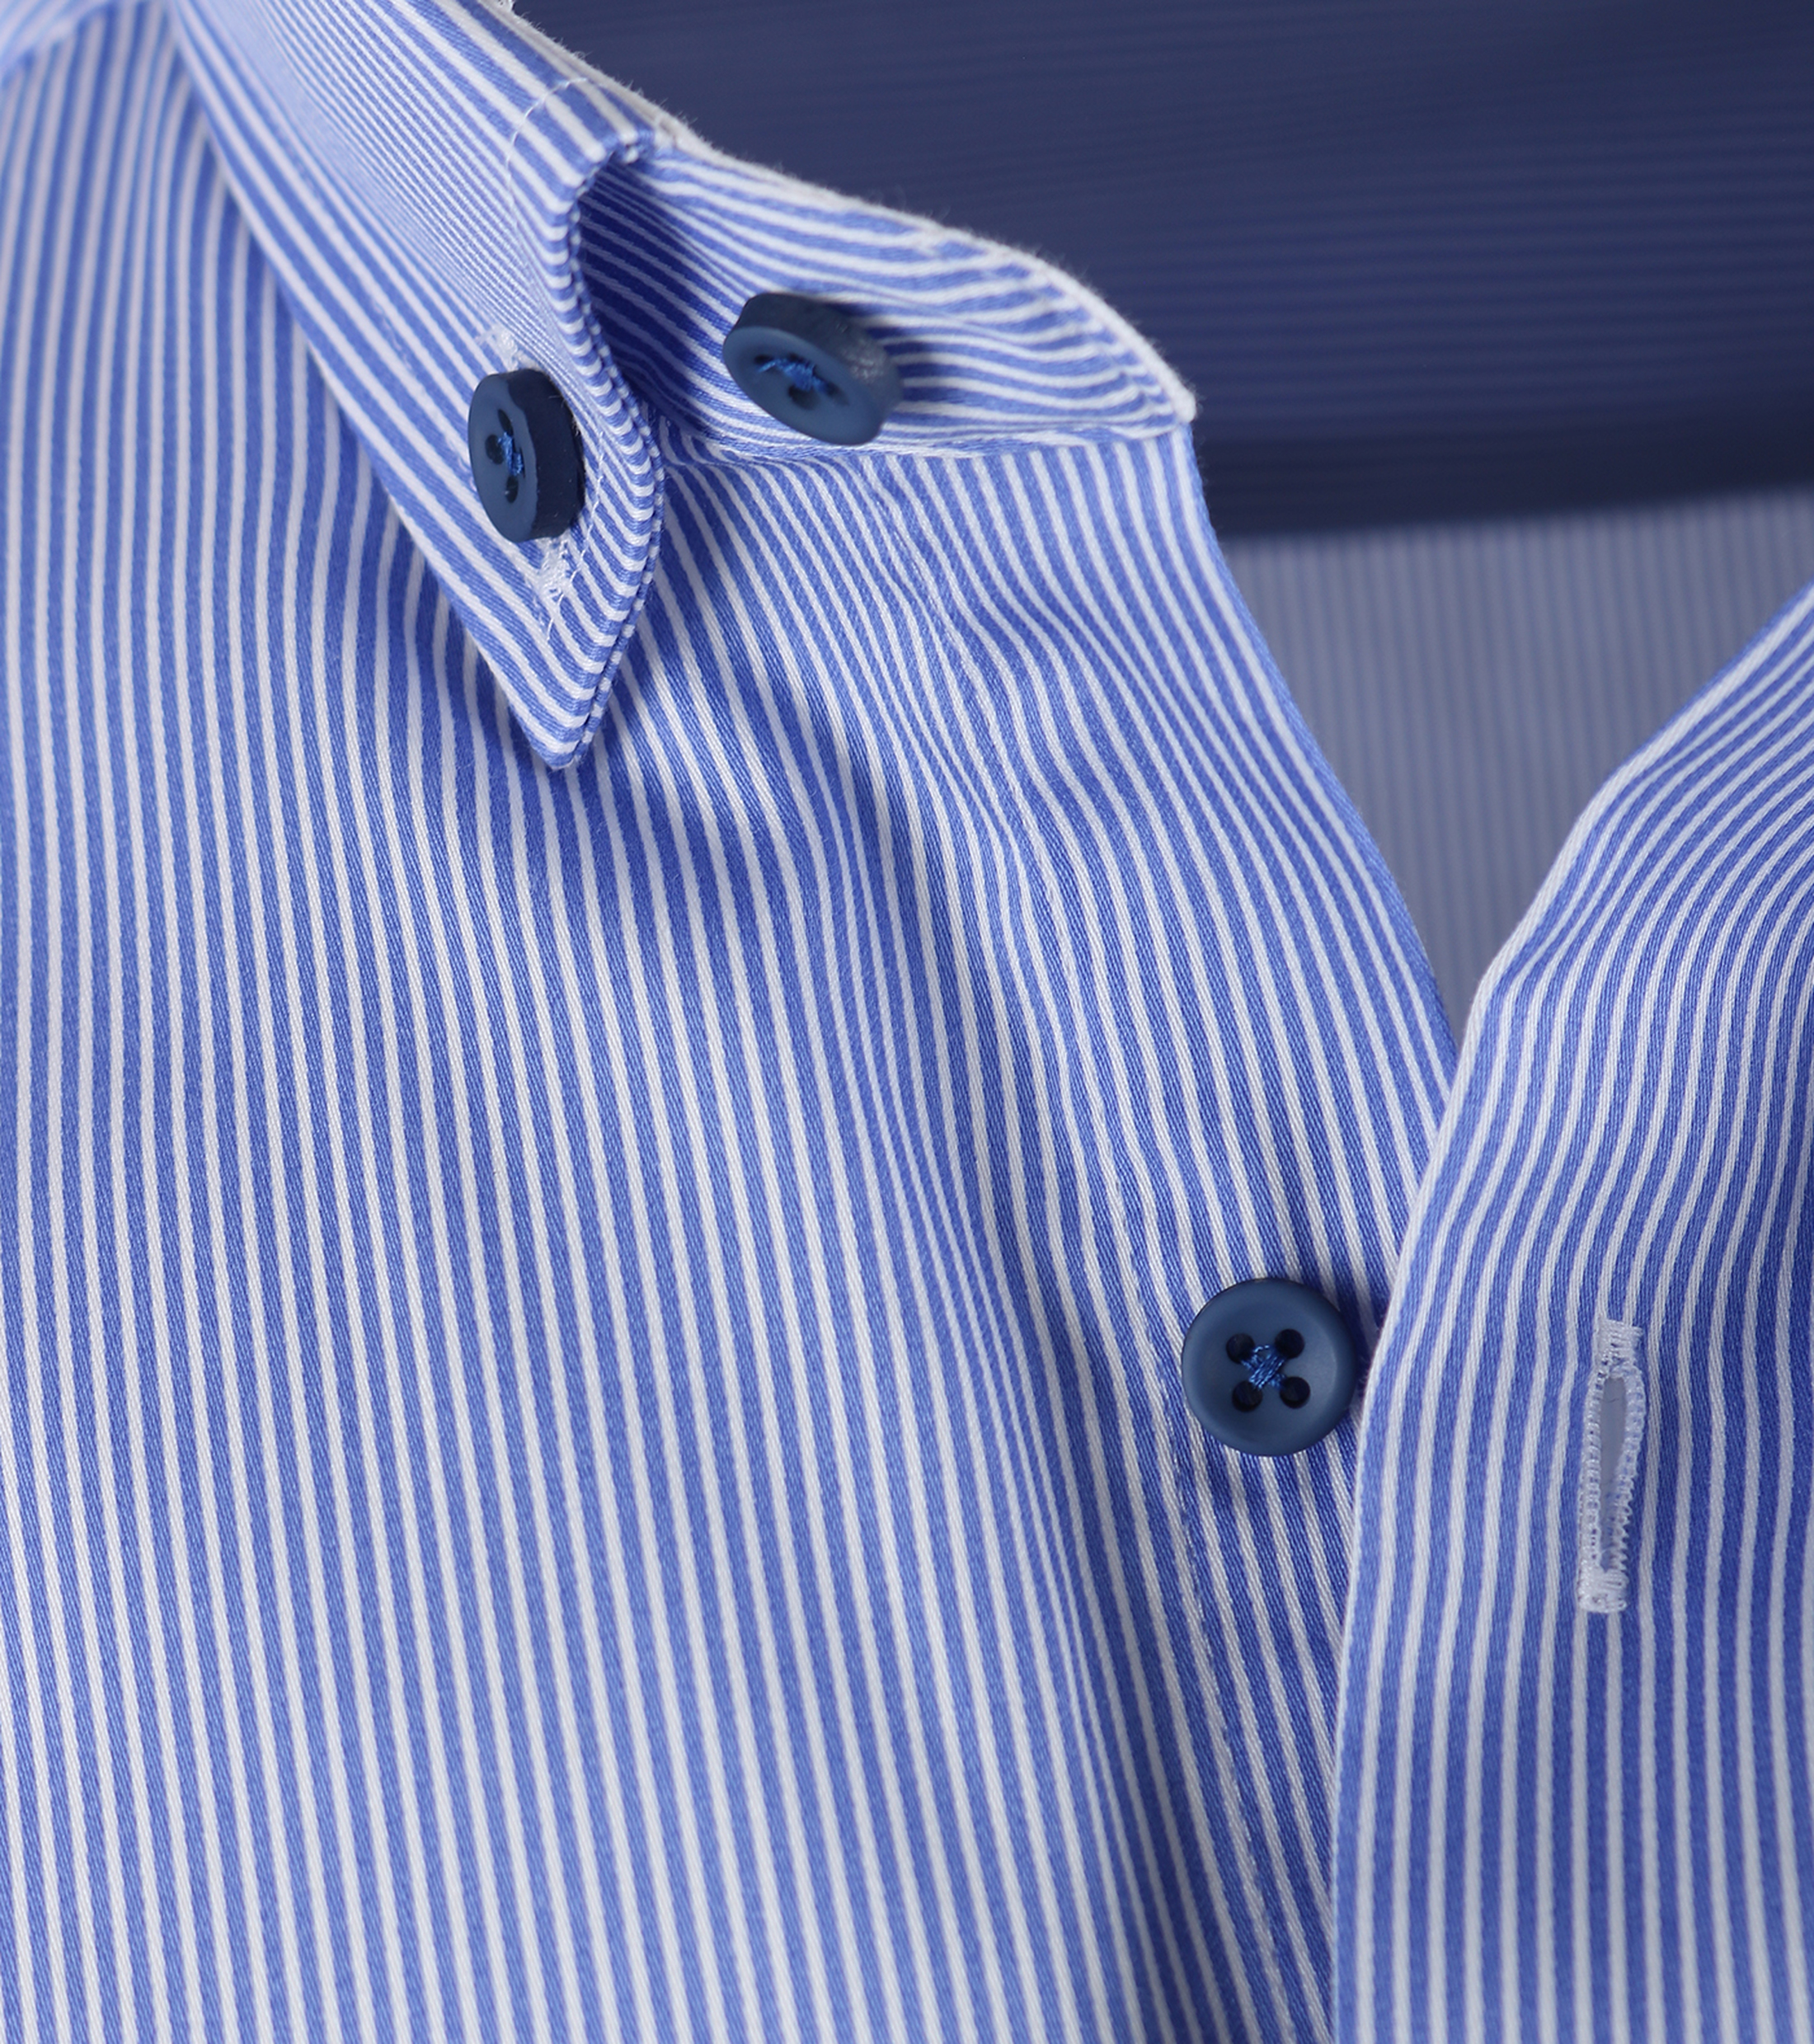 Casual Overhemd S3-6 Blauw Wit foto 1